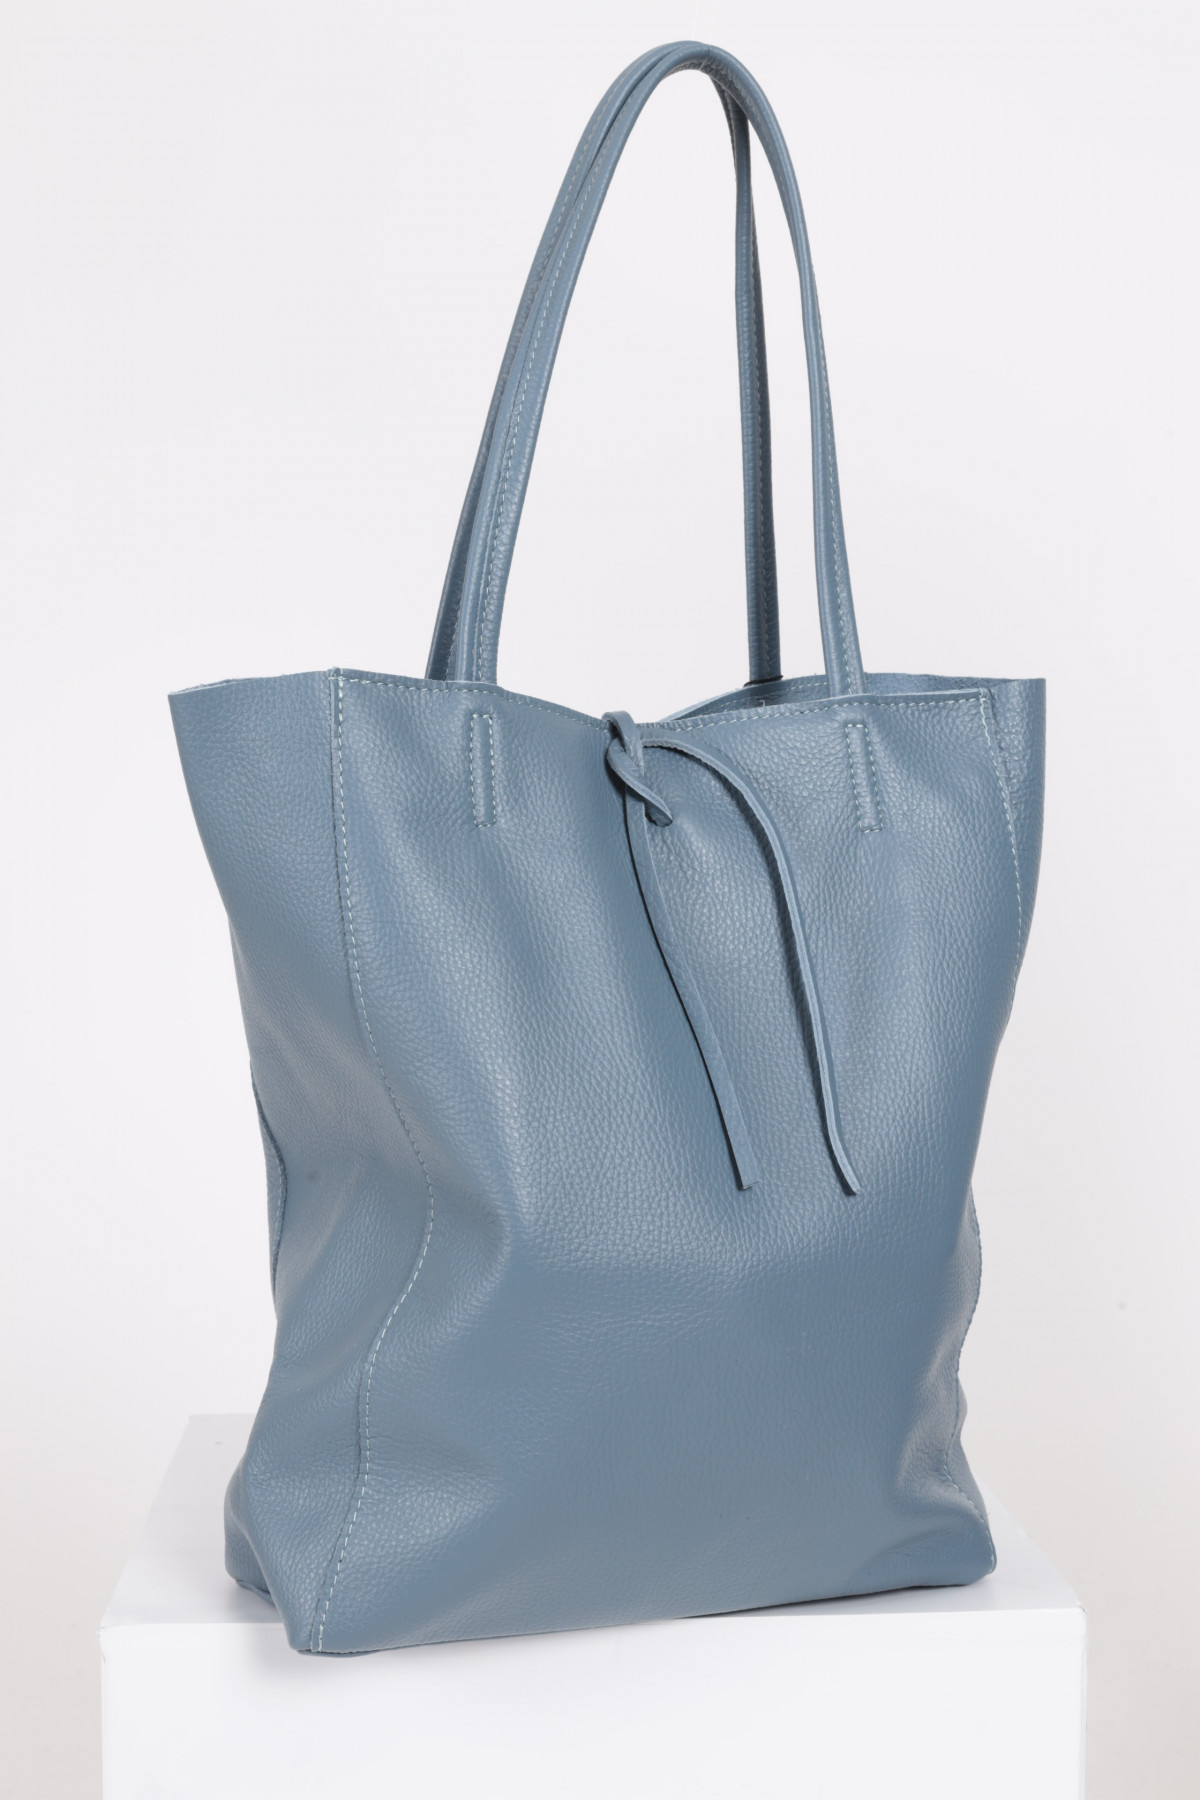 Cabas Bag in Hammered Leather